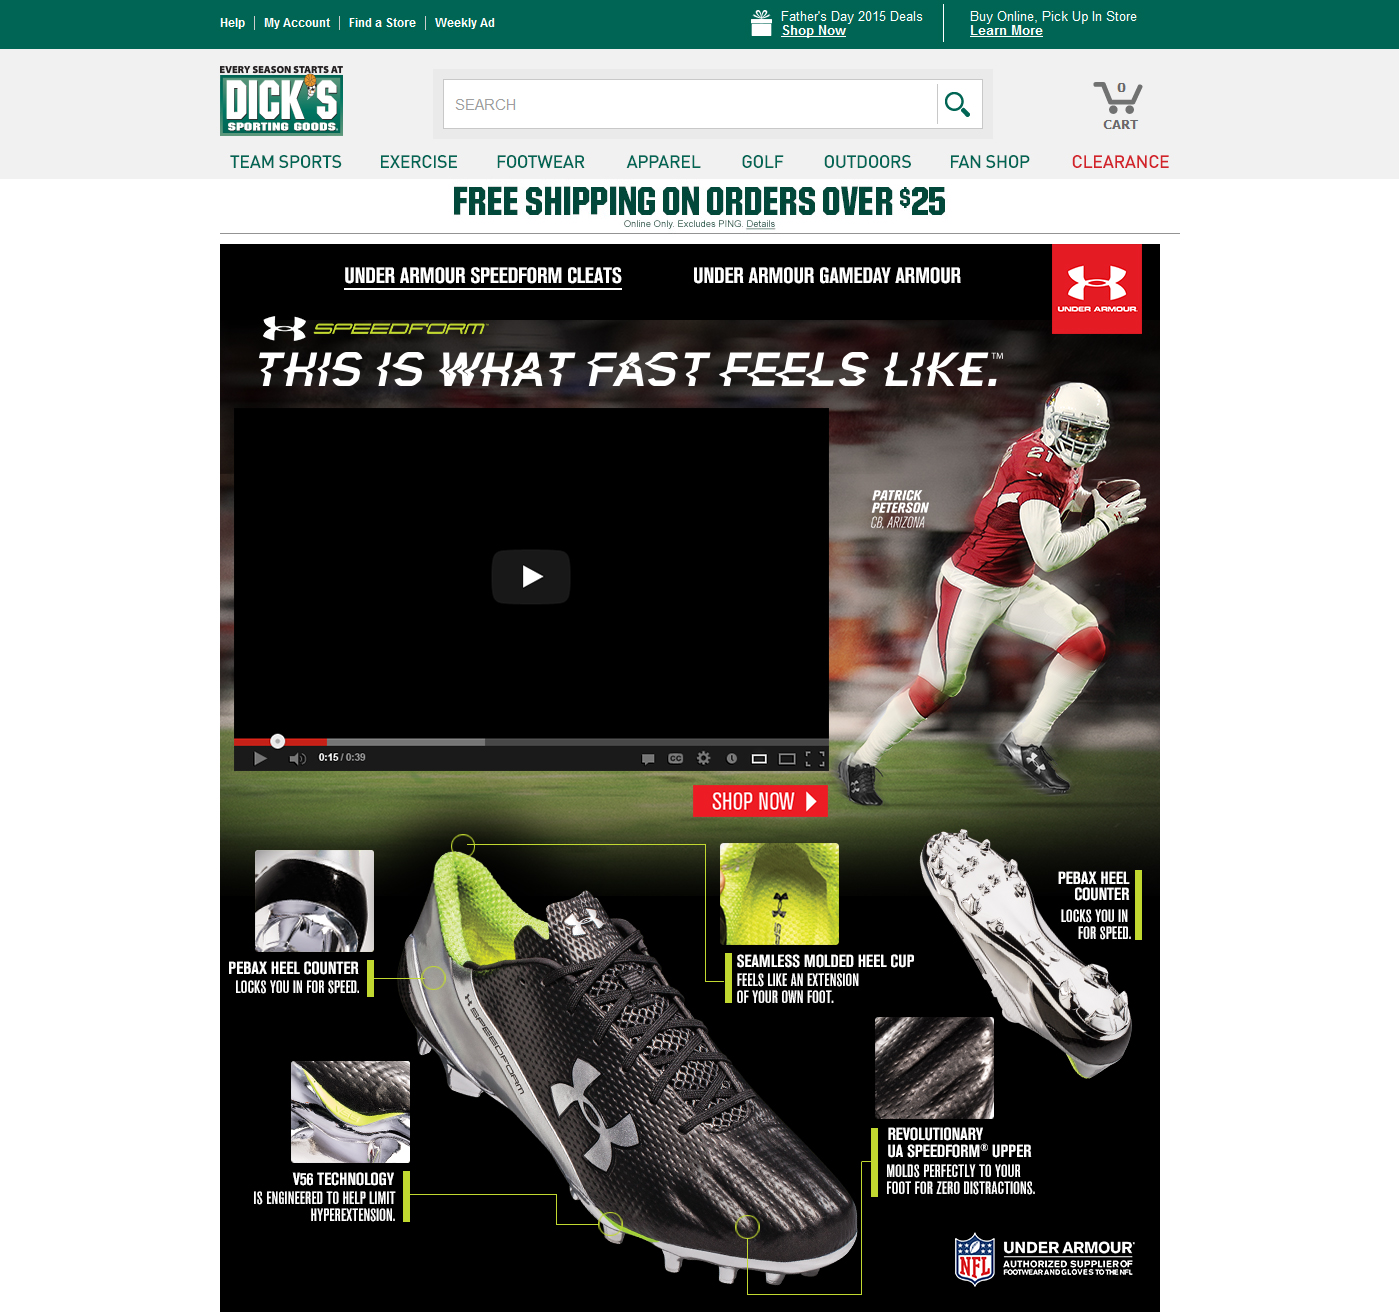 Under Armour - Speedform Football - Dicks Sporting Goods Landing Page